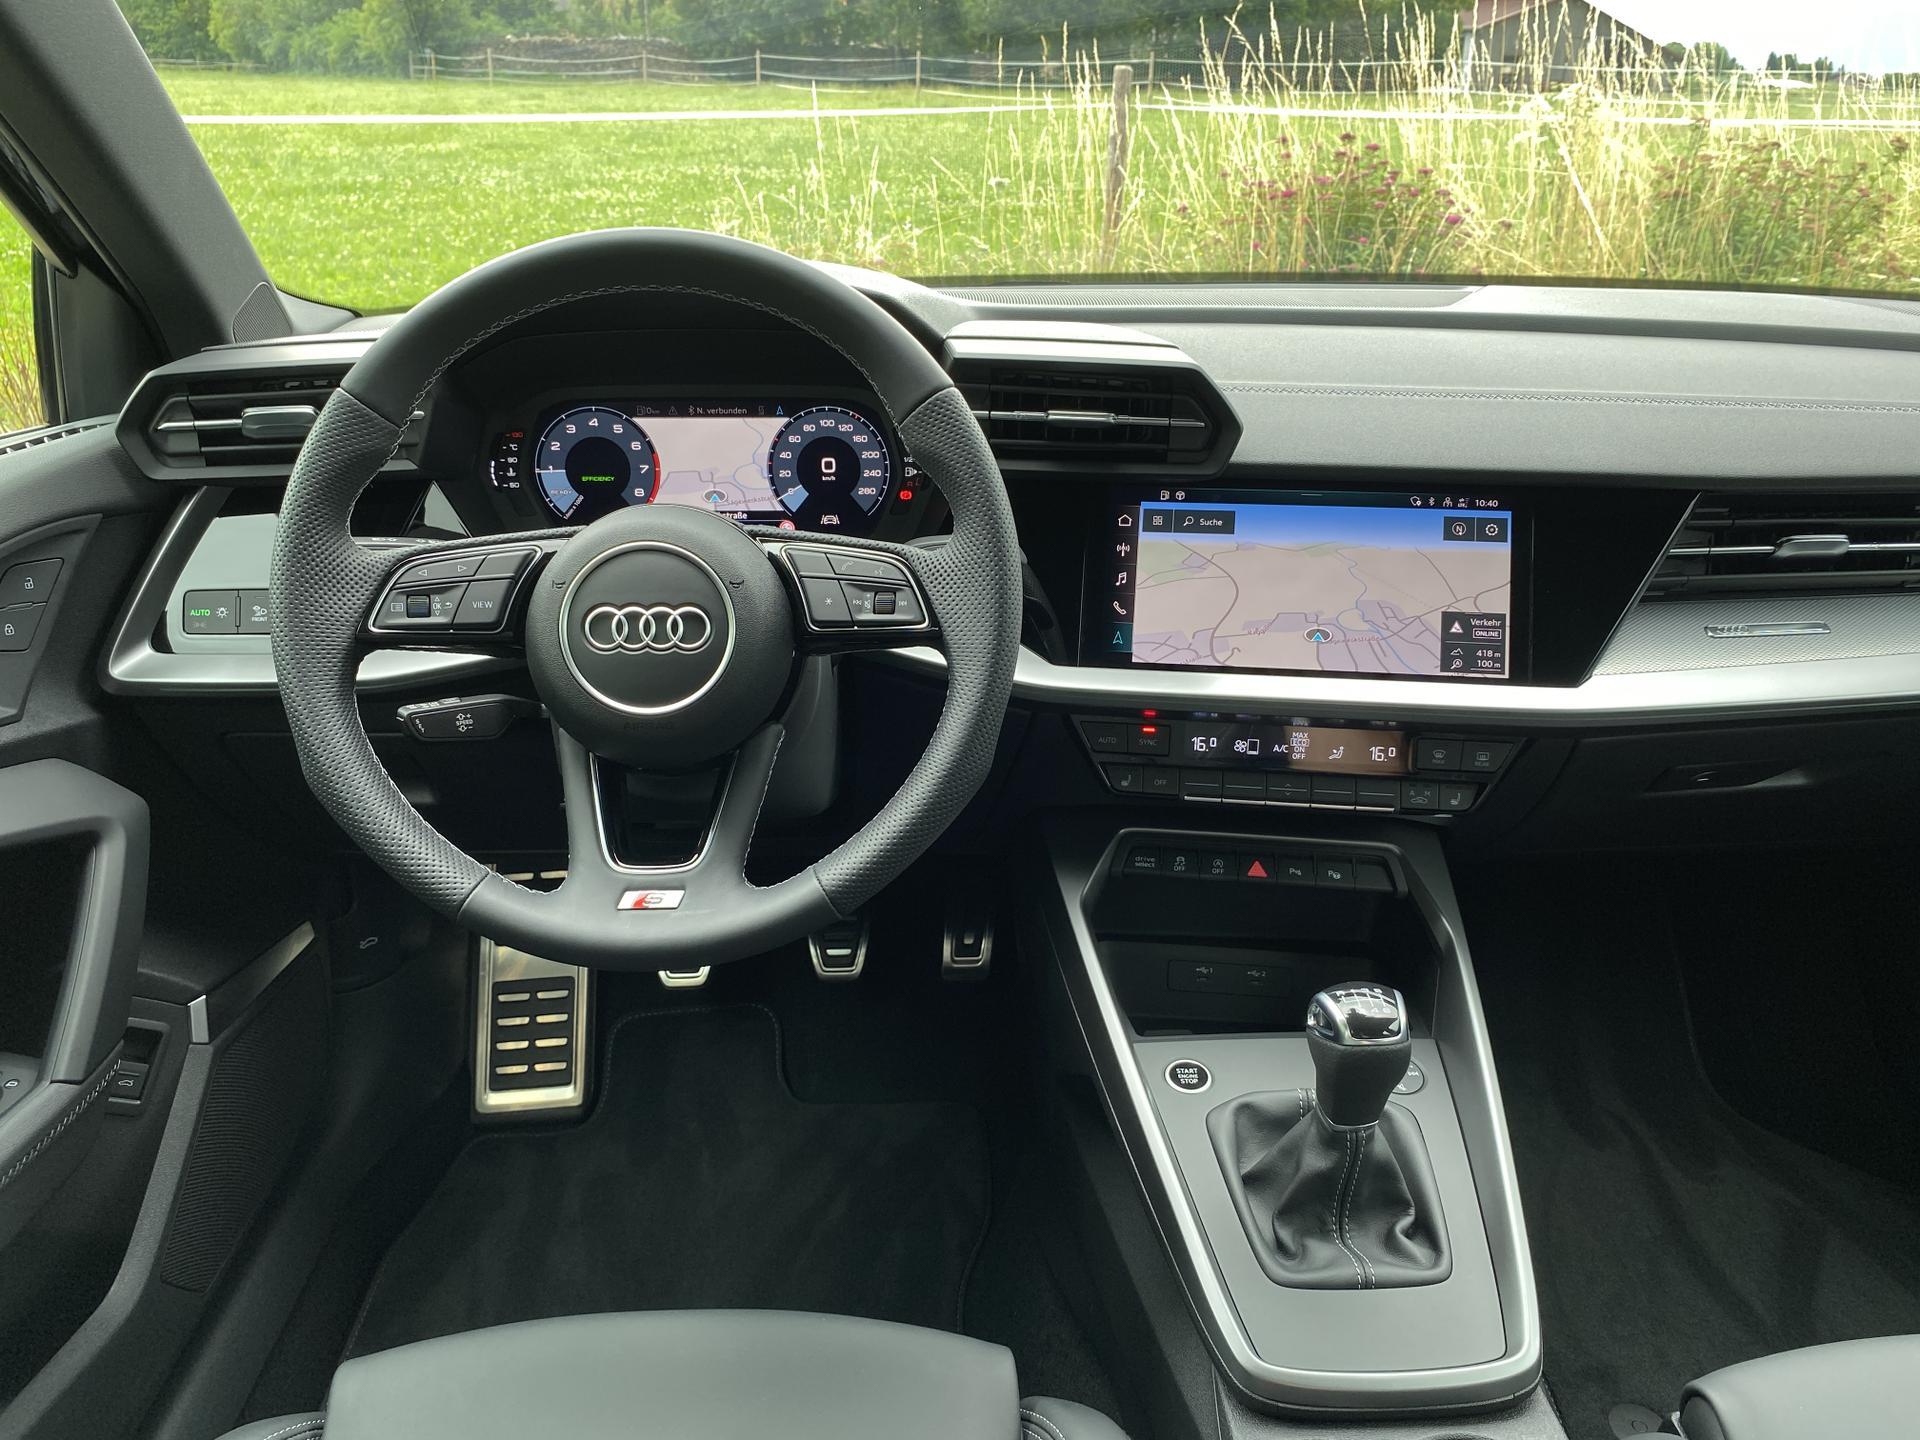 Audi A3 Lenkrad, Multimedia, Schaltgetriebe